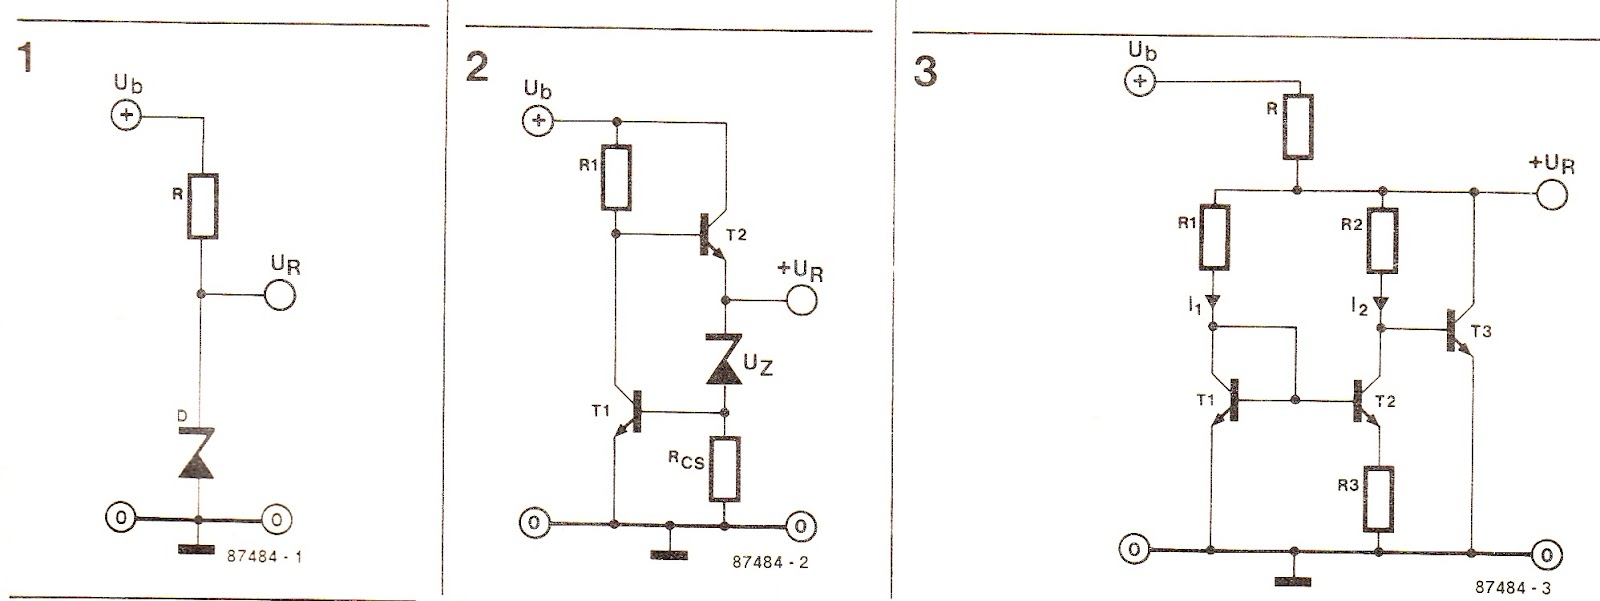 small resolution of zener diode circuit zener diode voltage regulator circuit zener diode diagram zener regulator circuit diode in